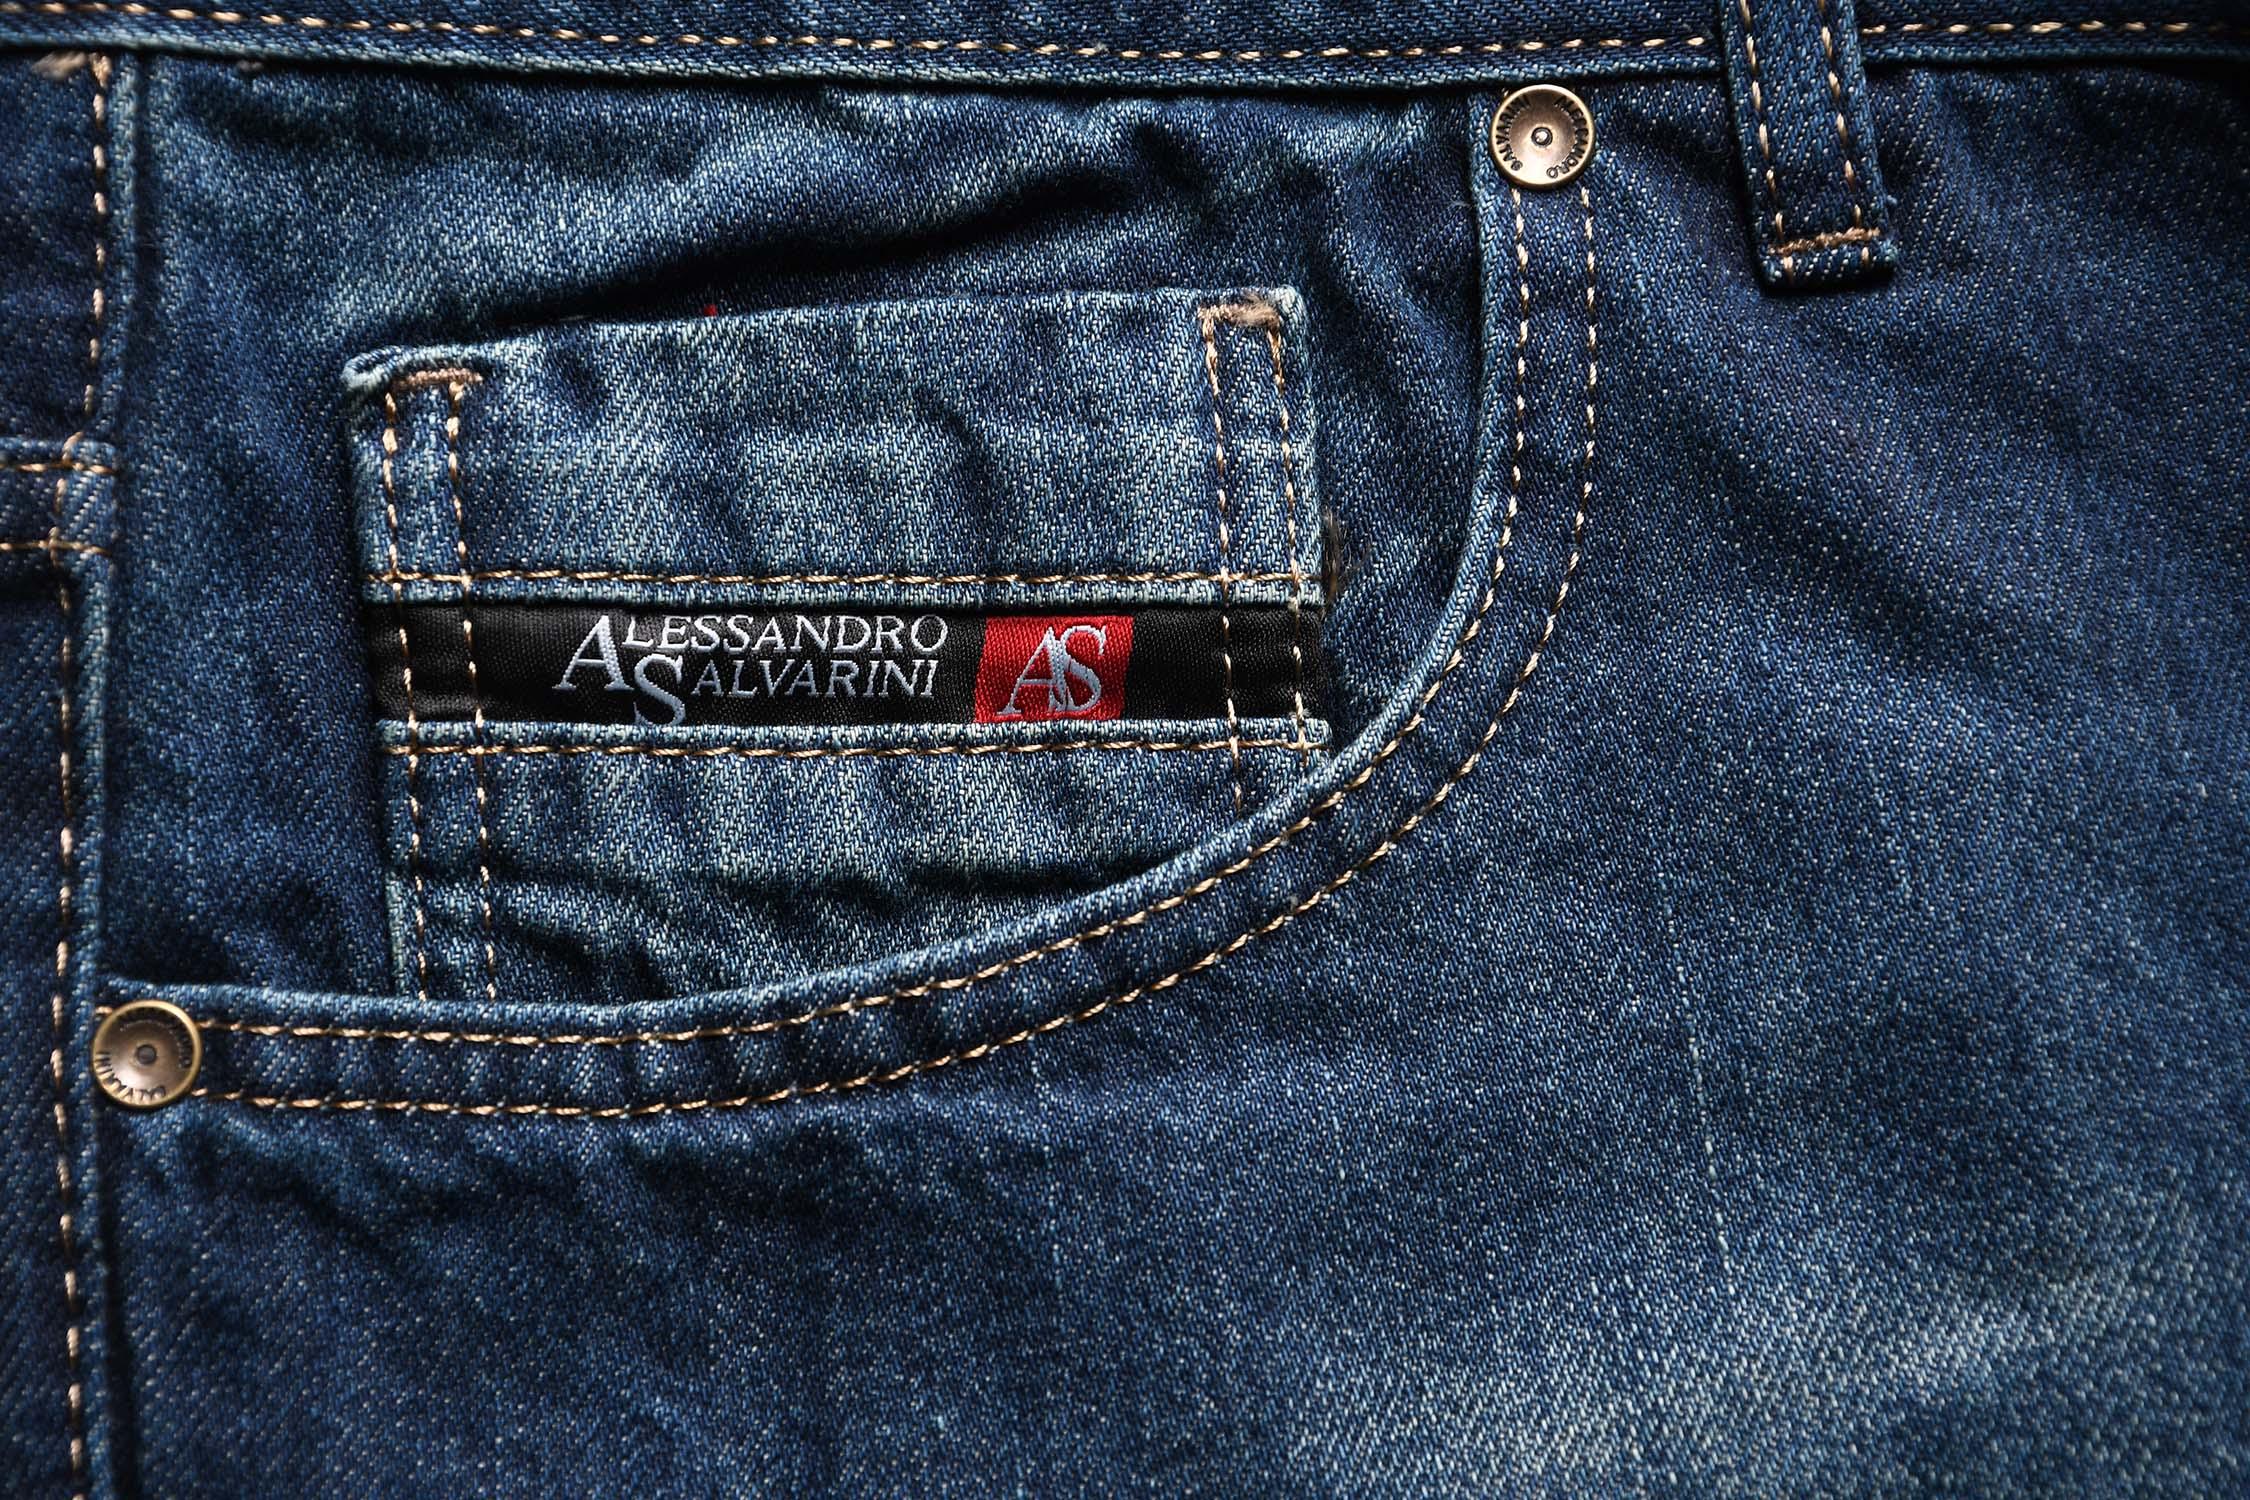 A-Salvarini-Beppo-Designer-Herren-Jeans-Hose-Basic-Jeanshose-Comfort-Fit Indexbild 15